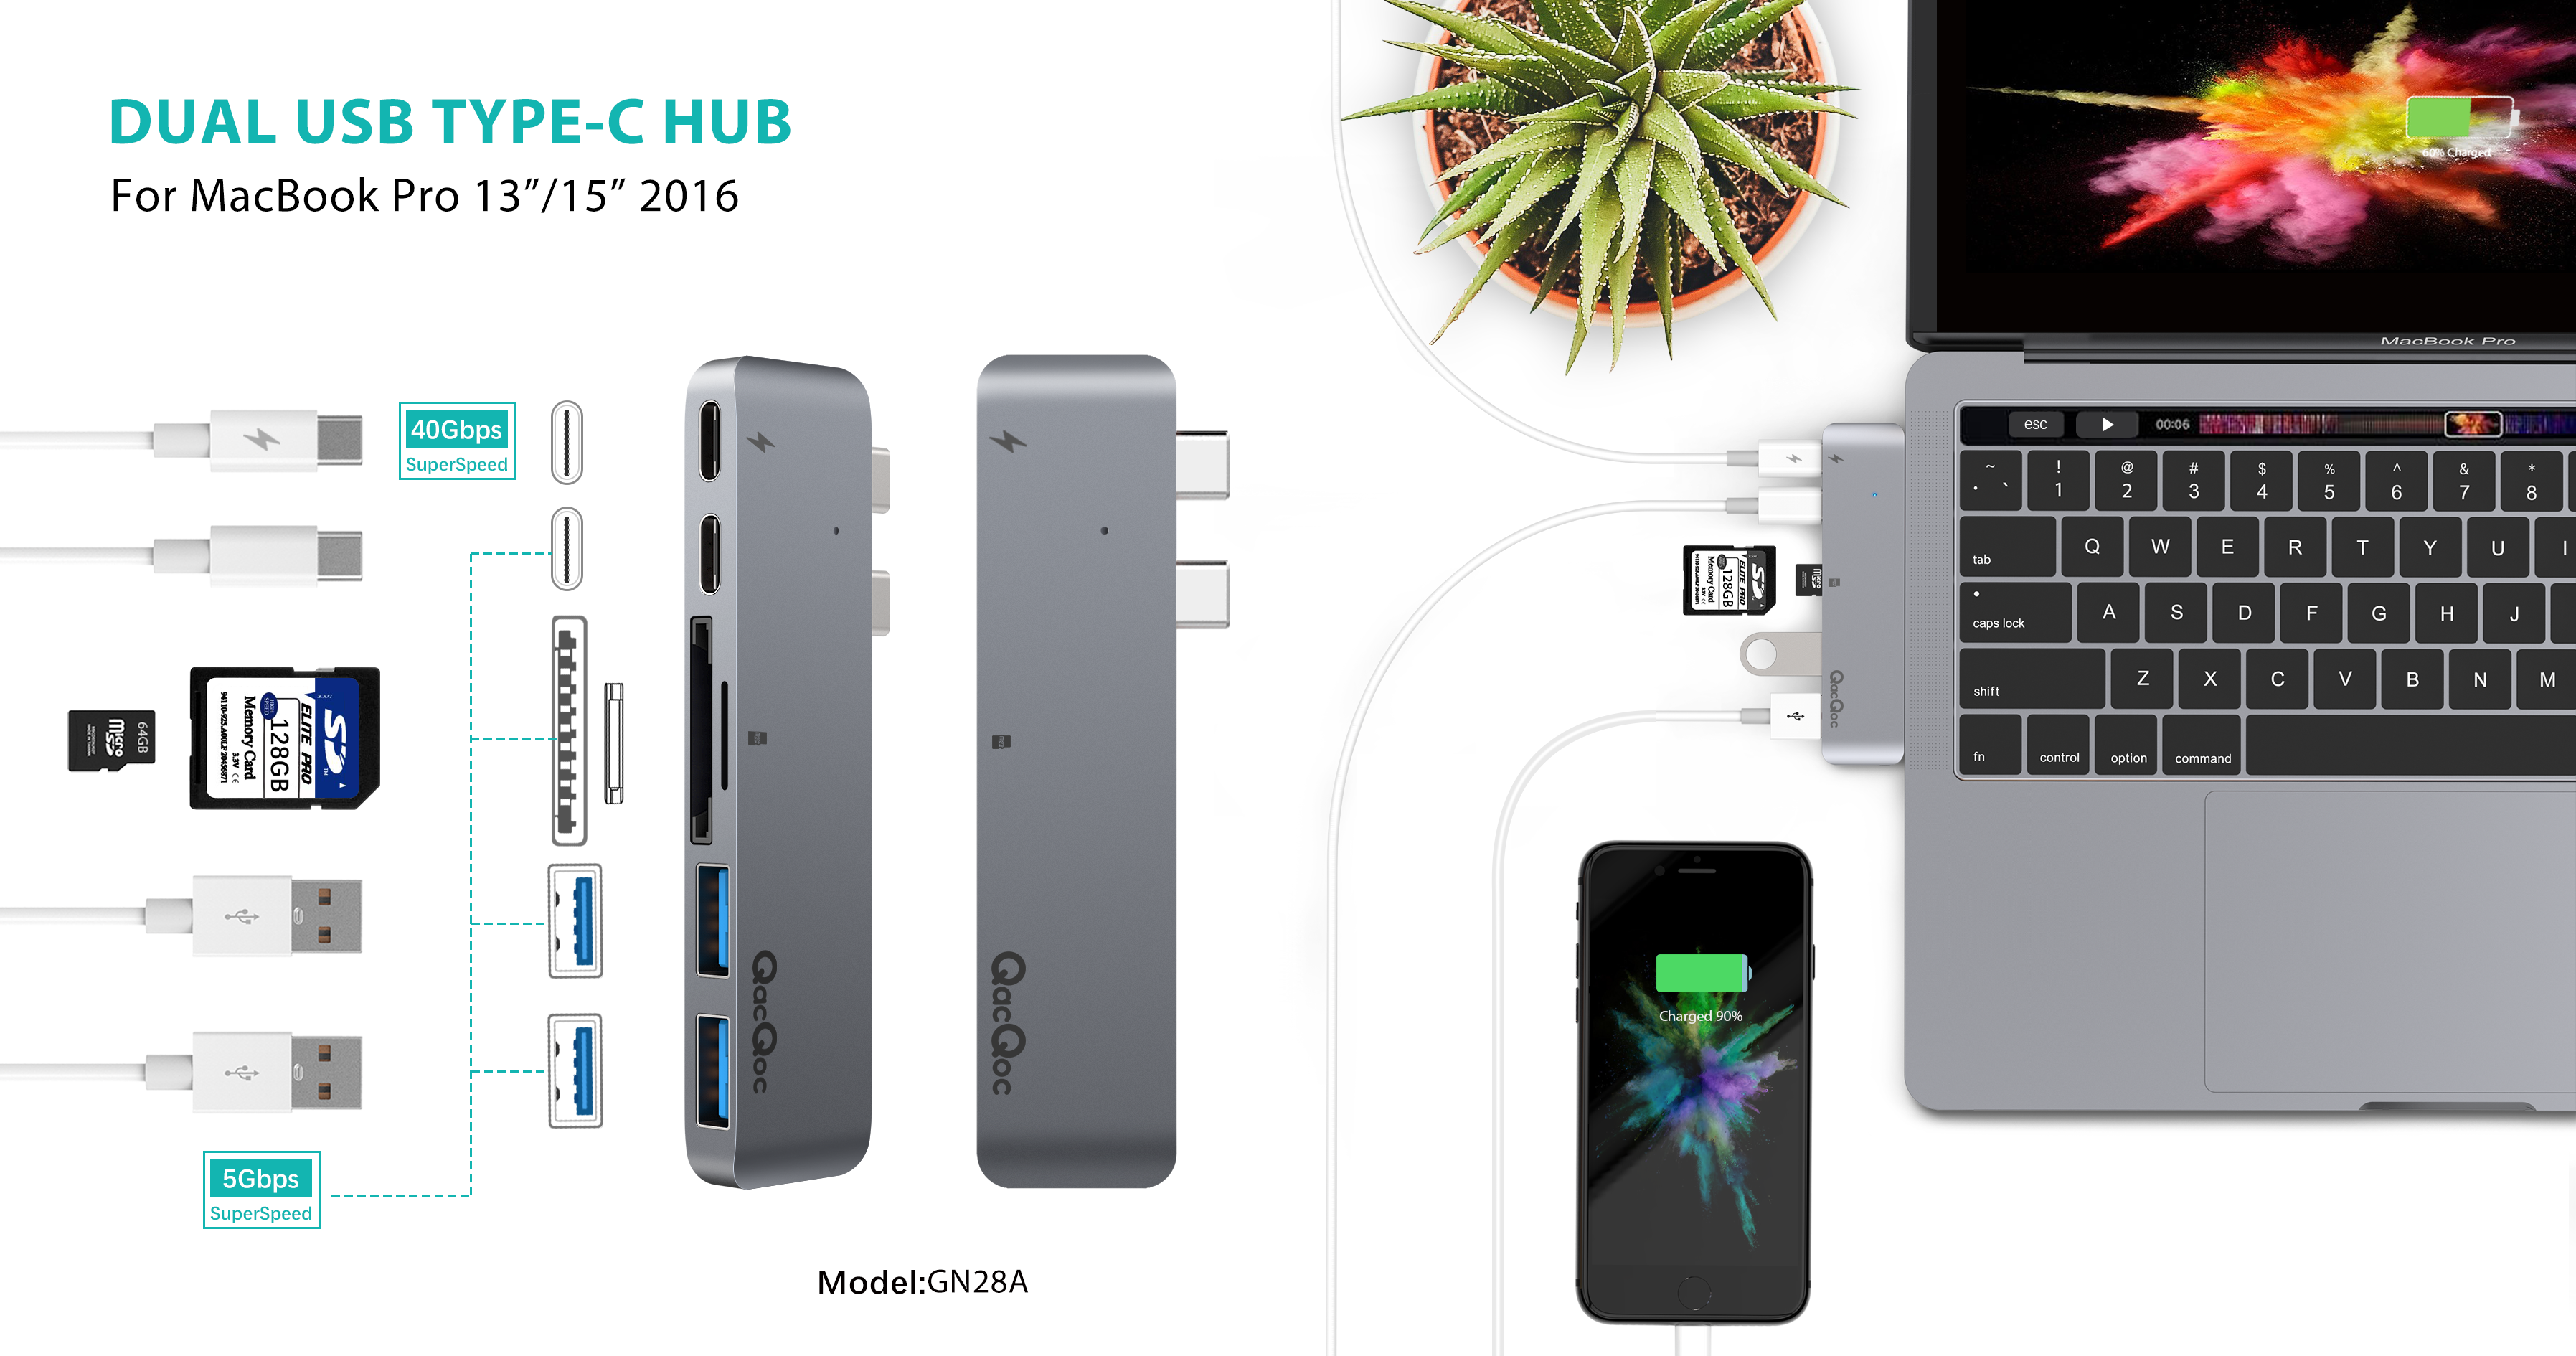 QacQoc's Innovative USB Hub for New MacBook Pro 13'/15'